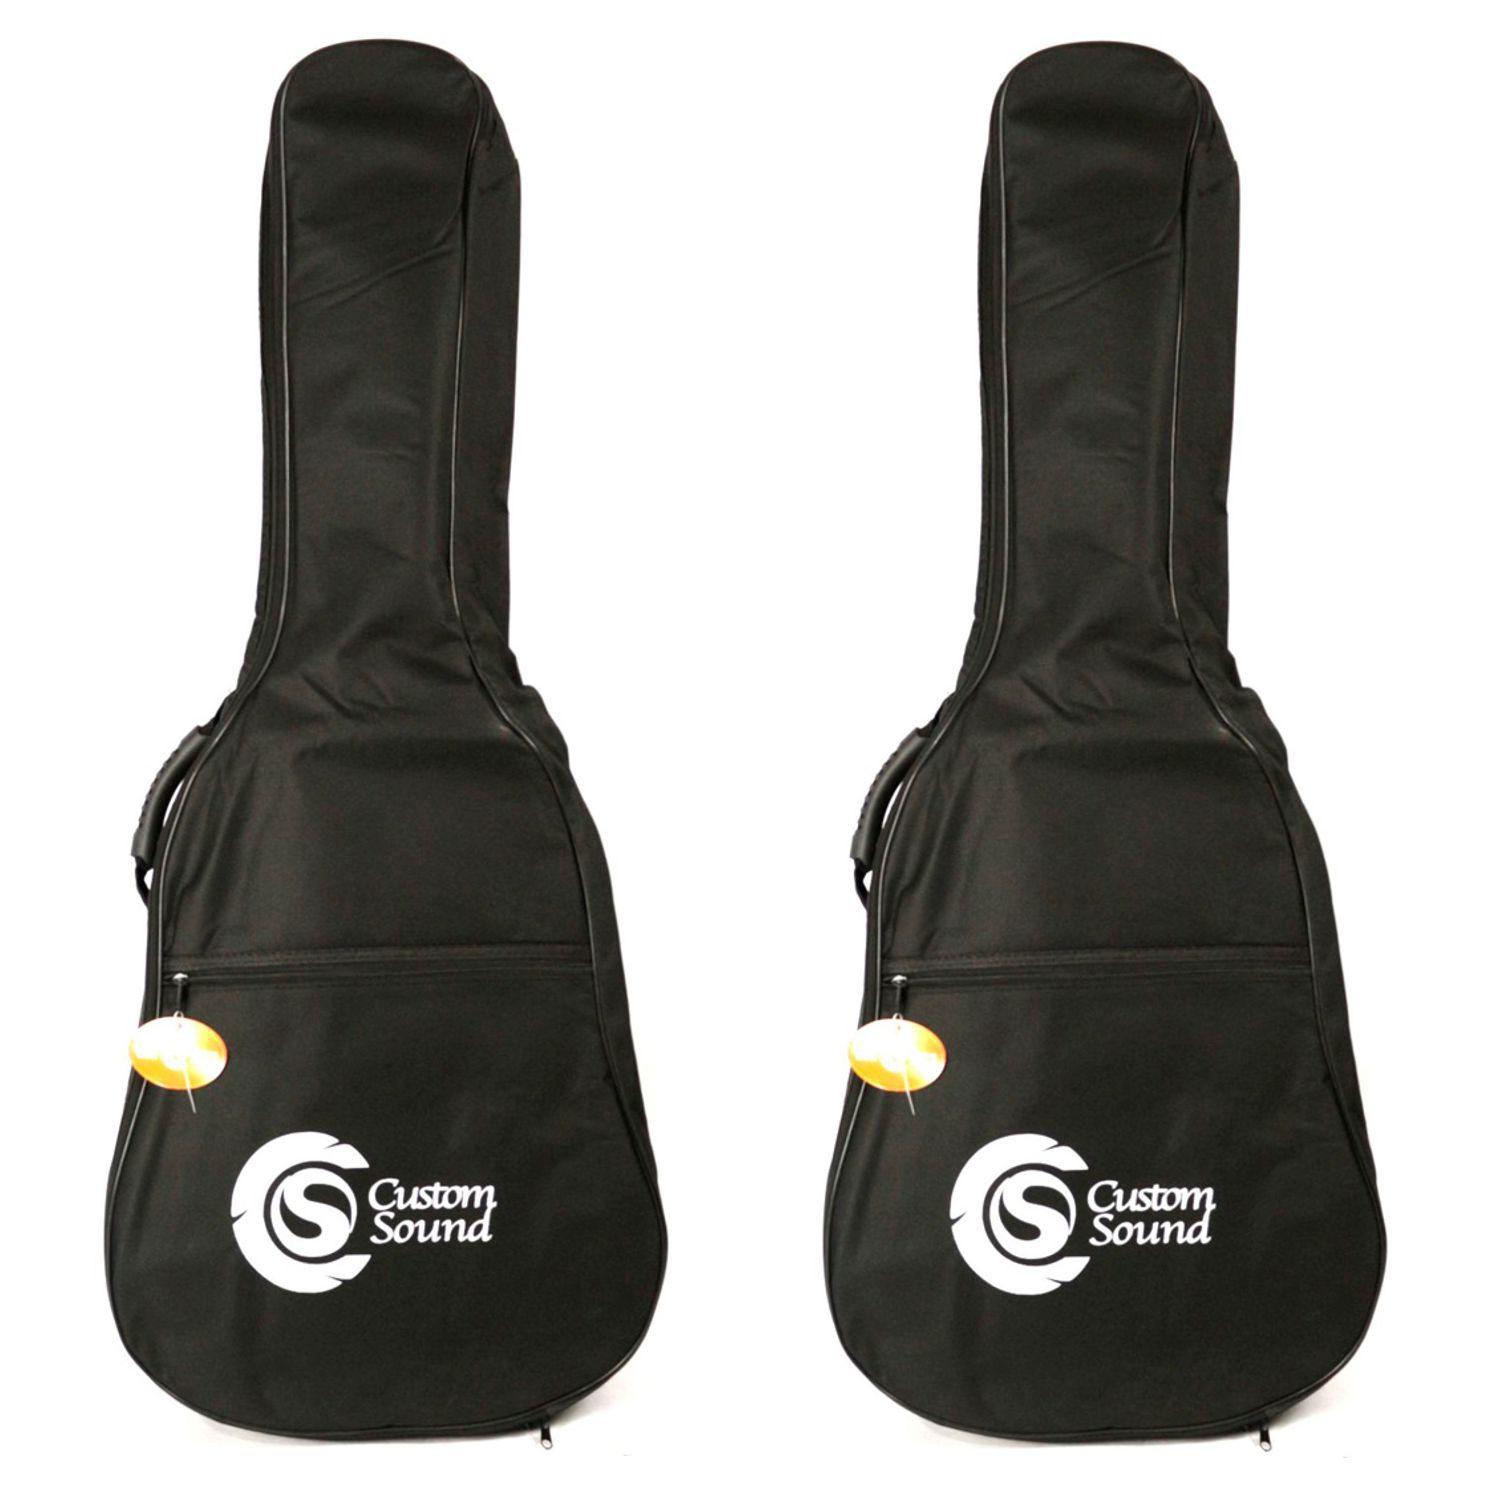 Capa Custom Sound Luxo para Violão FOLK - Preta CVF1-BK 02 Unidades